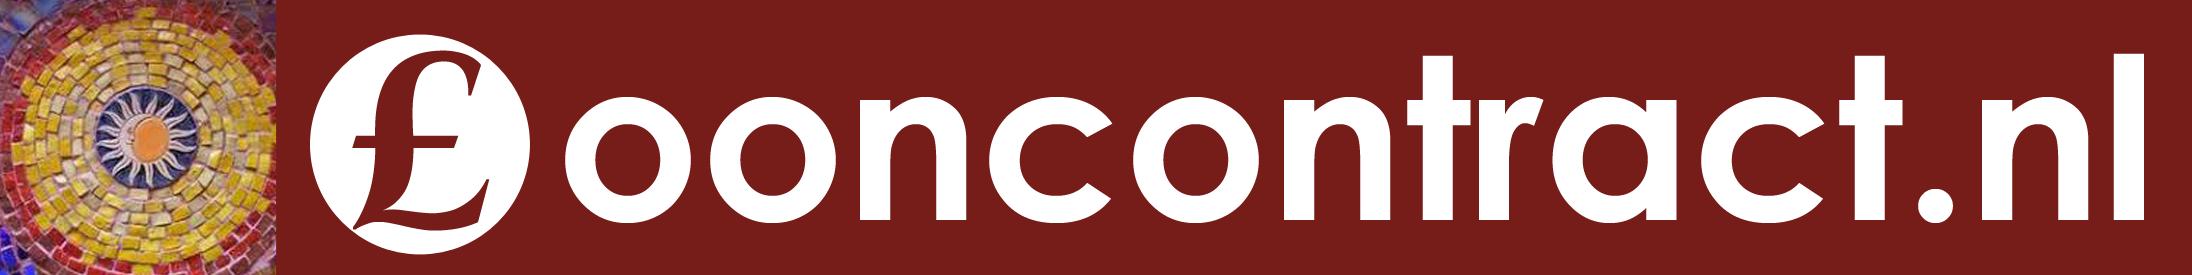 £oonContract.nl